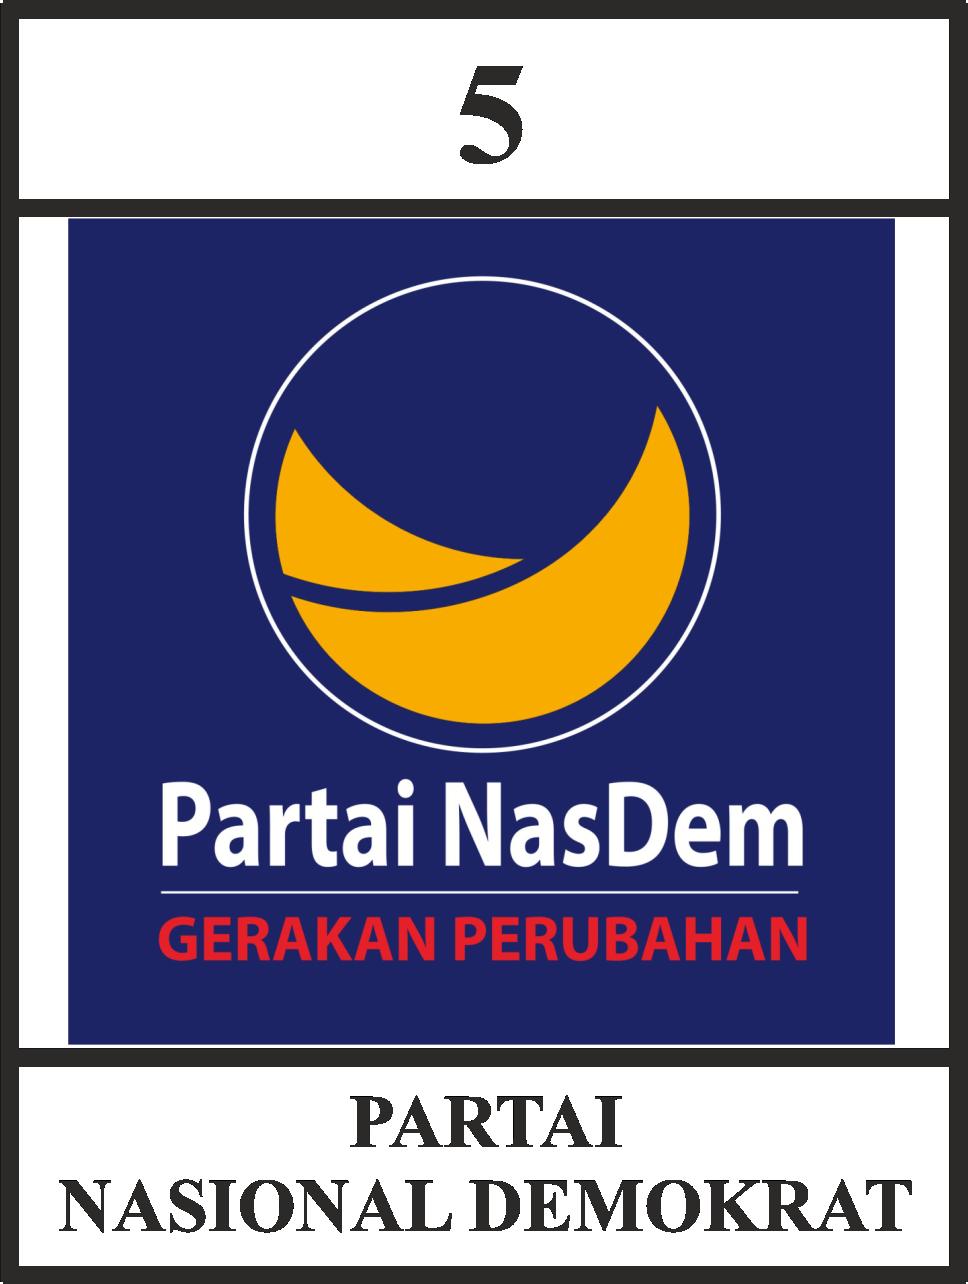 Logo Nasdem Vector : nasdem, vector, Partai, Nasional, Demokrat, (NasDem), Politik,, Politik